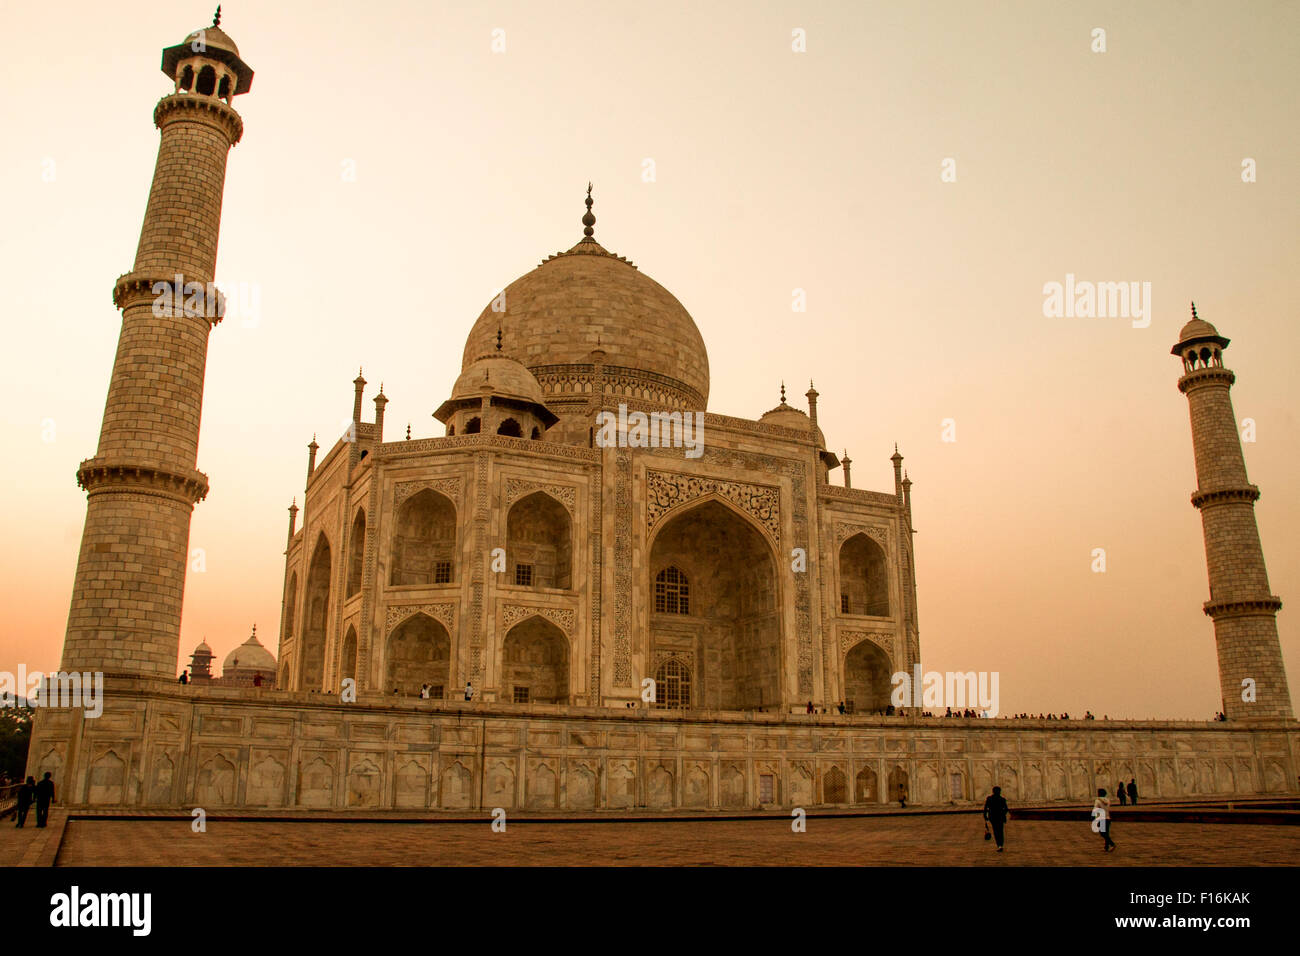 Taj Mahal bei Sonnenuntergang, Agra, Indien. Stockbild